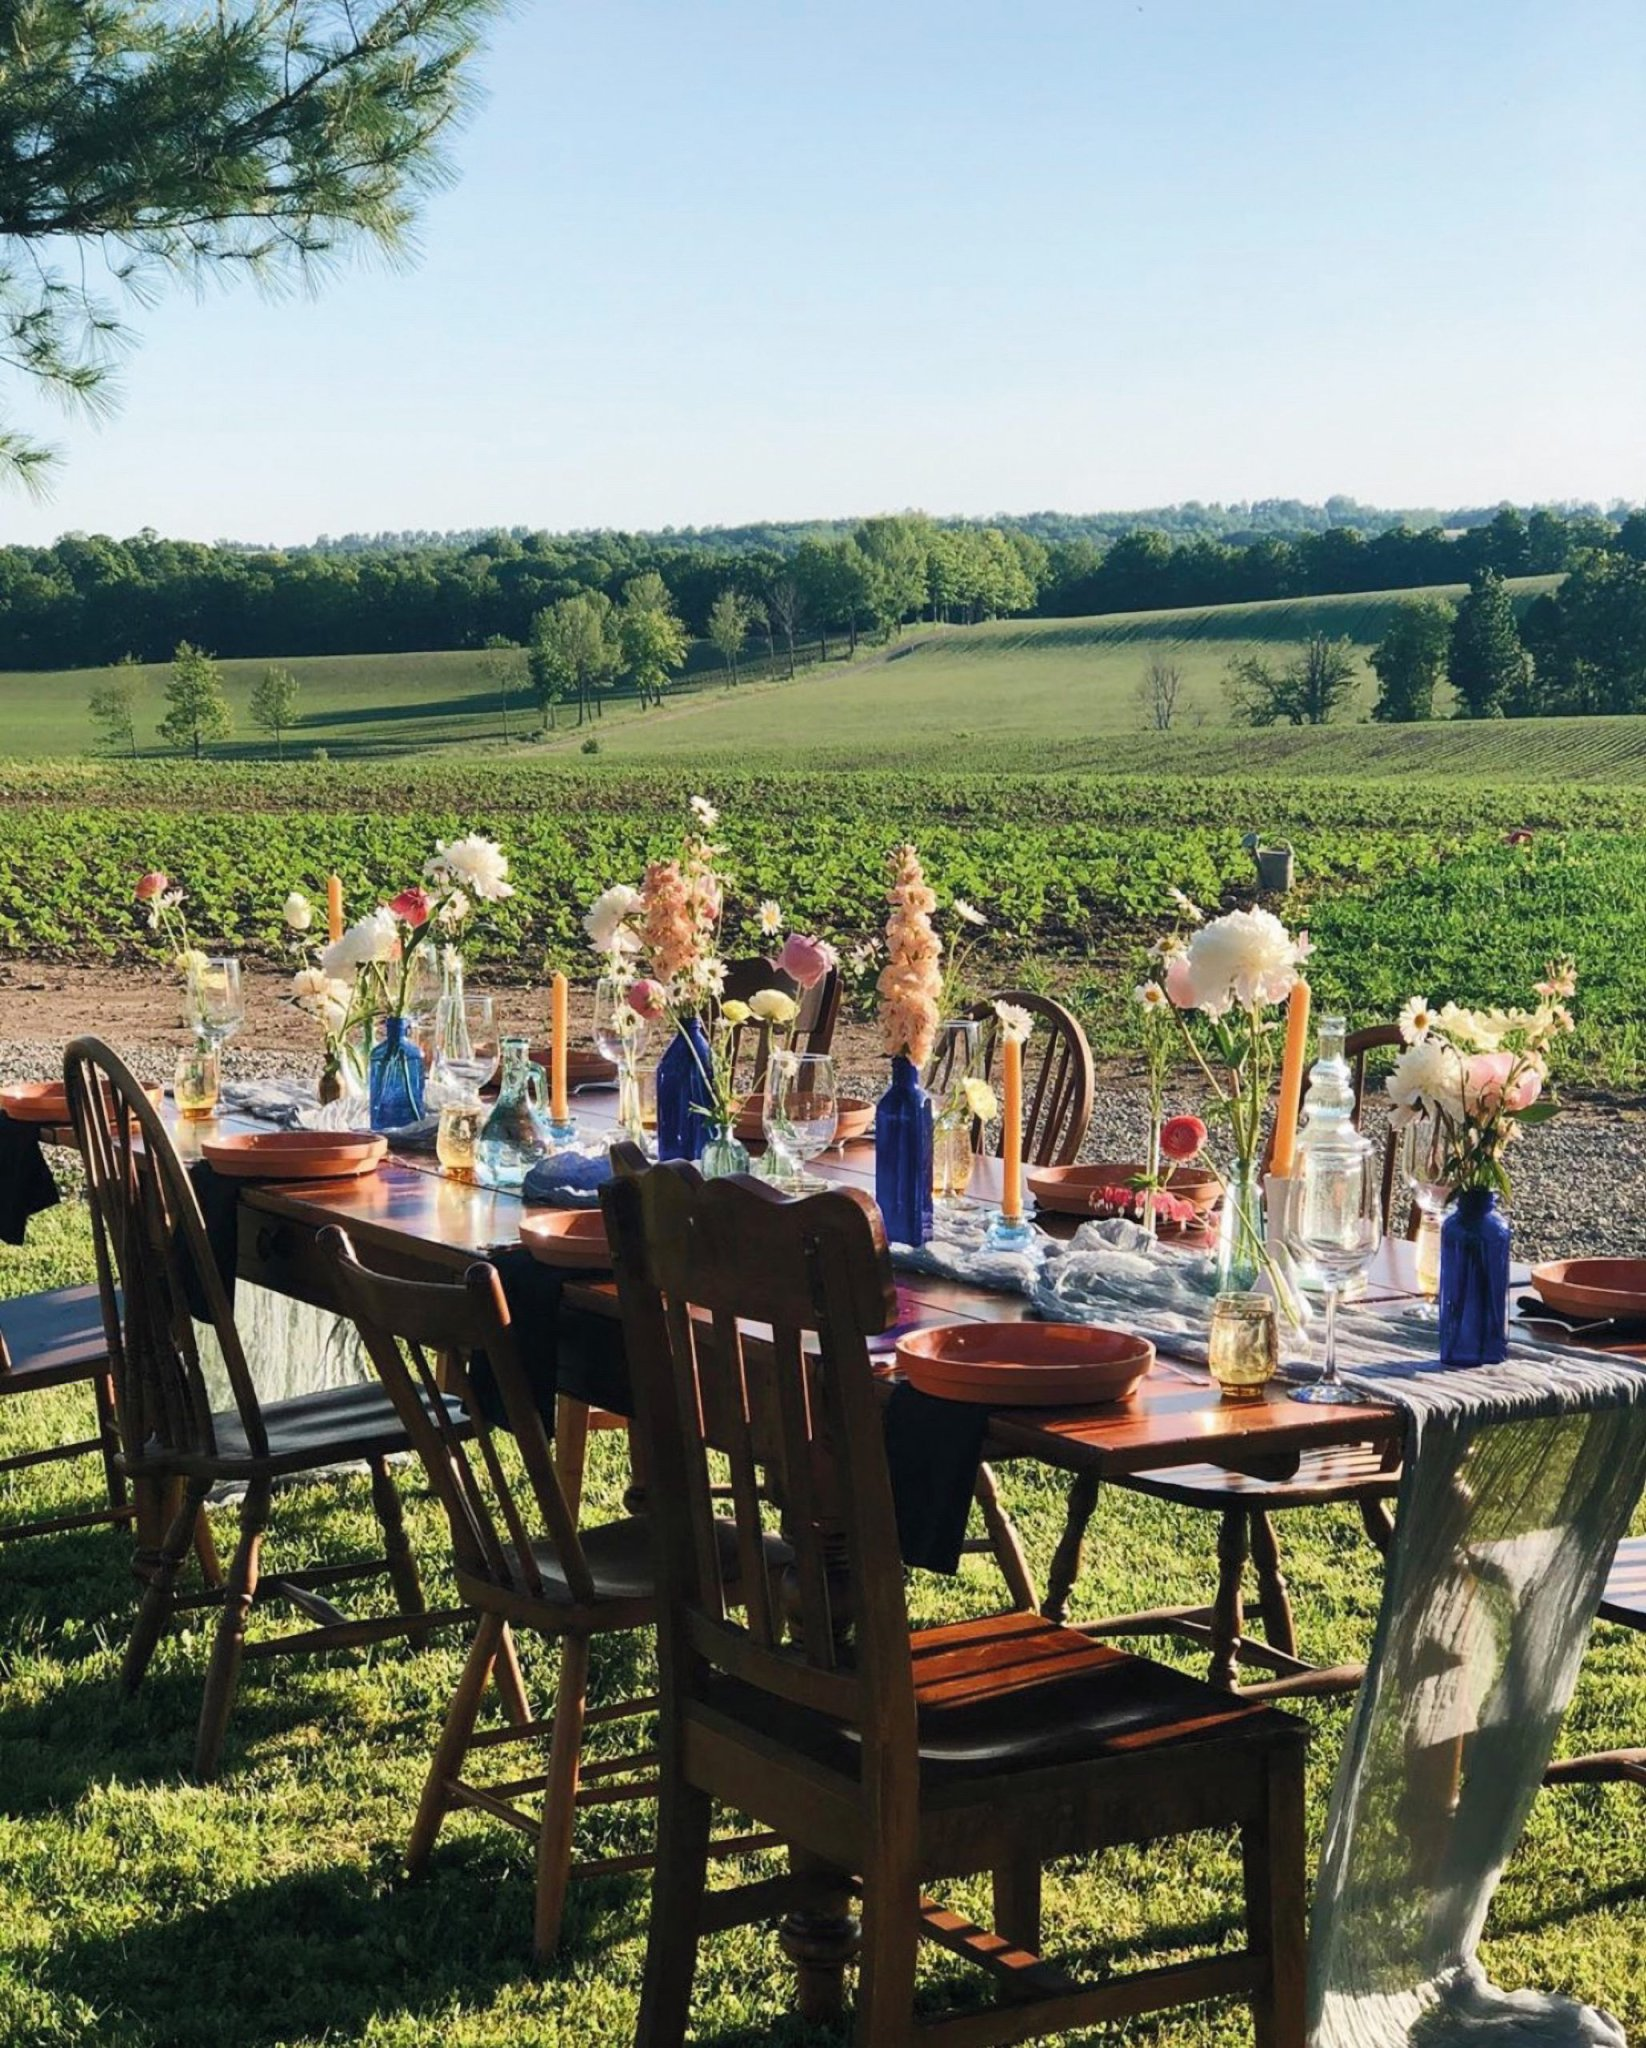 A Taste of Local: Experience Ontario's Farms